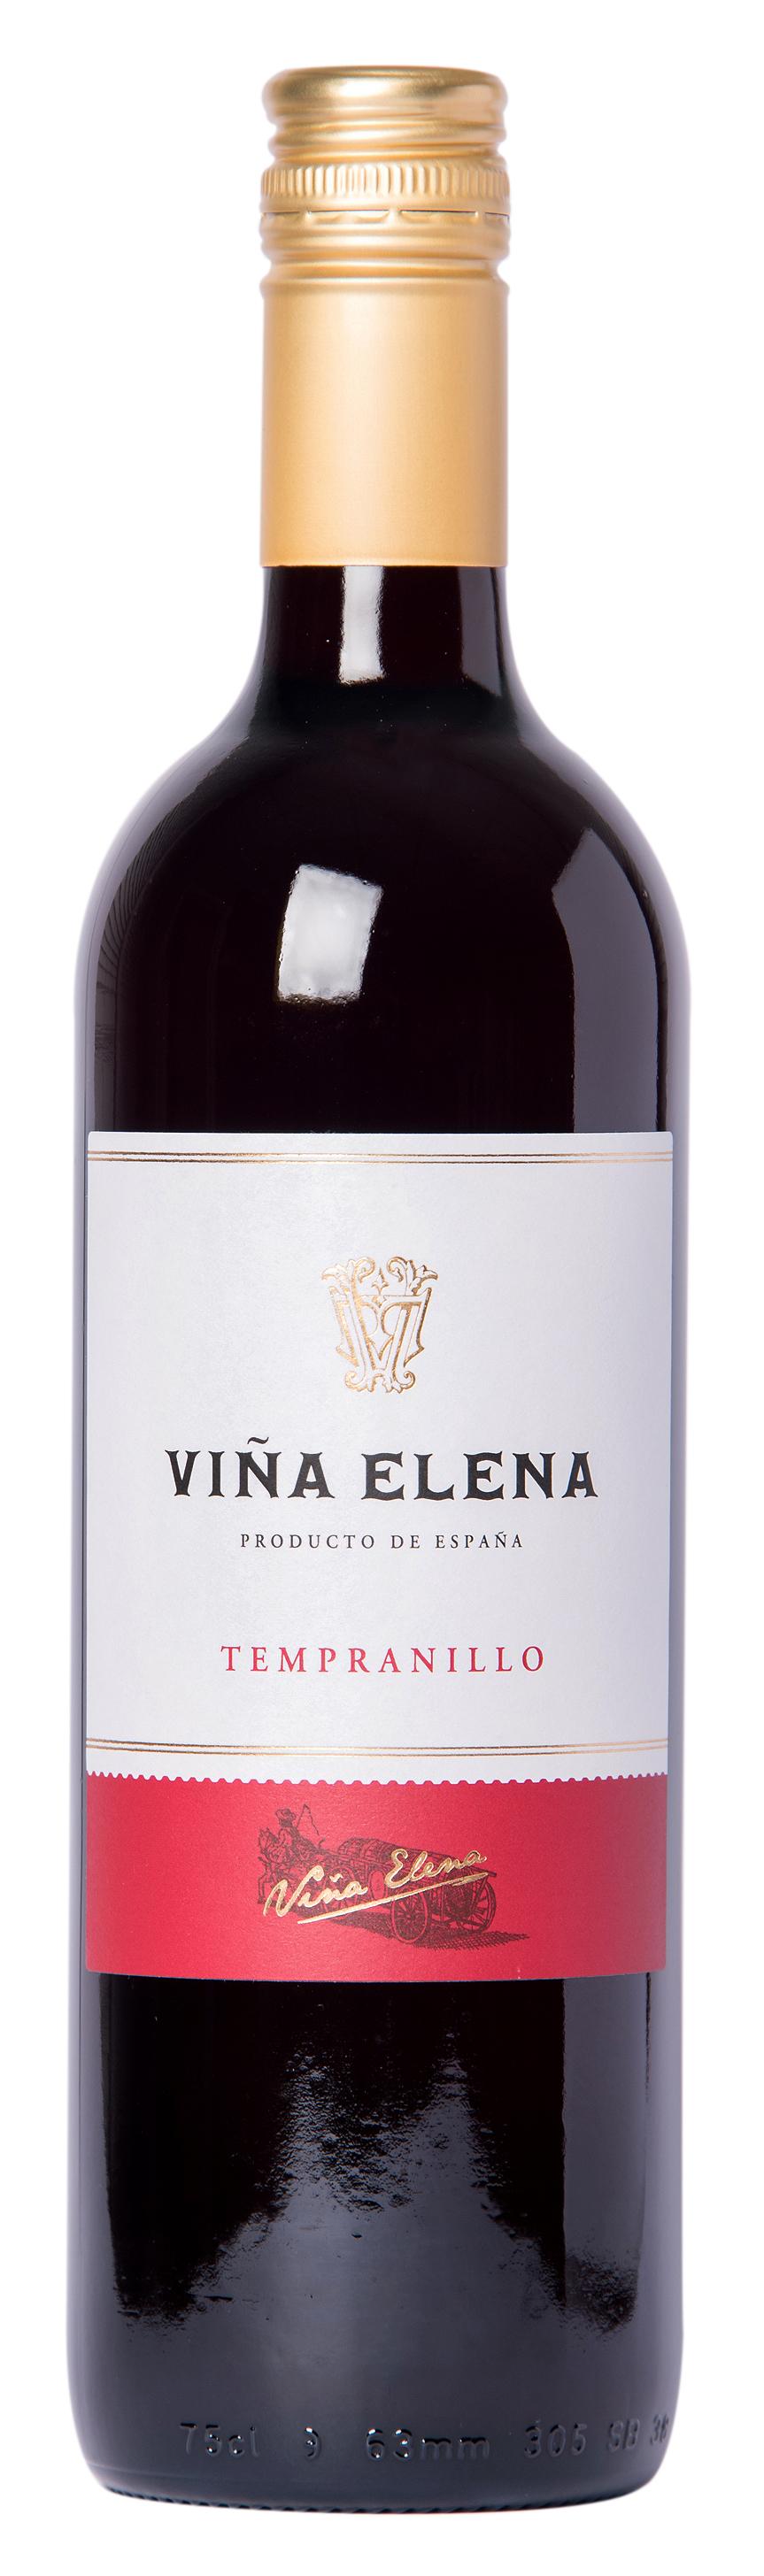 Vina Elena Tempranillo 75cl